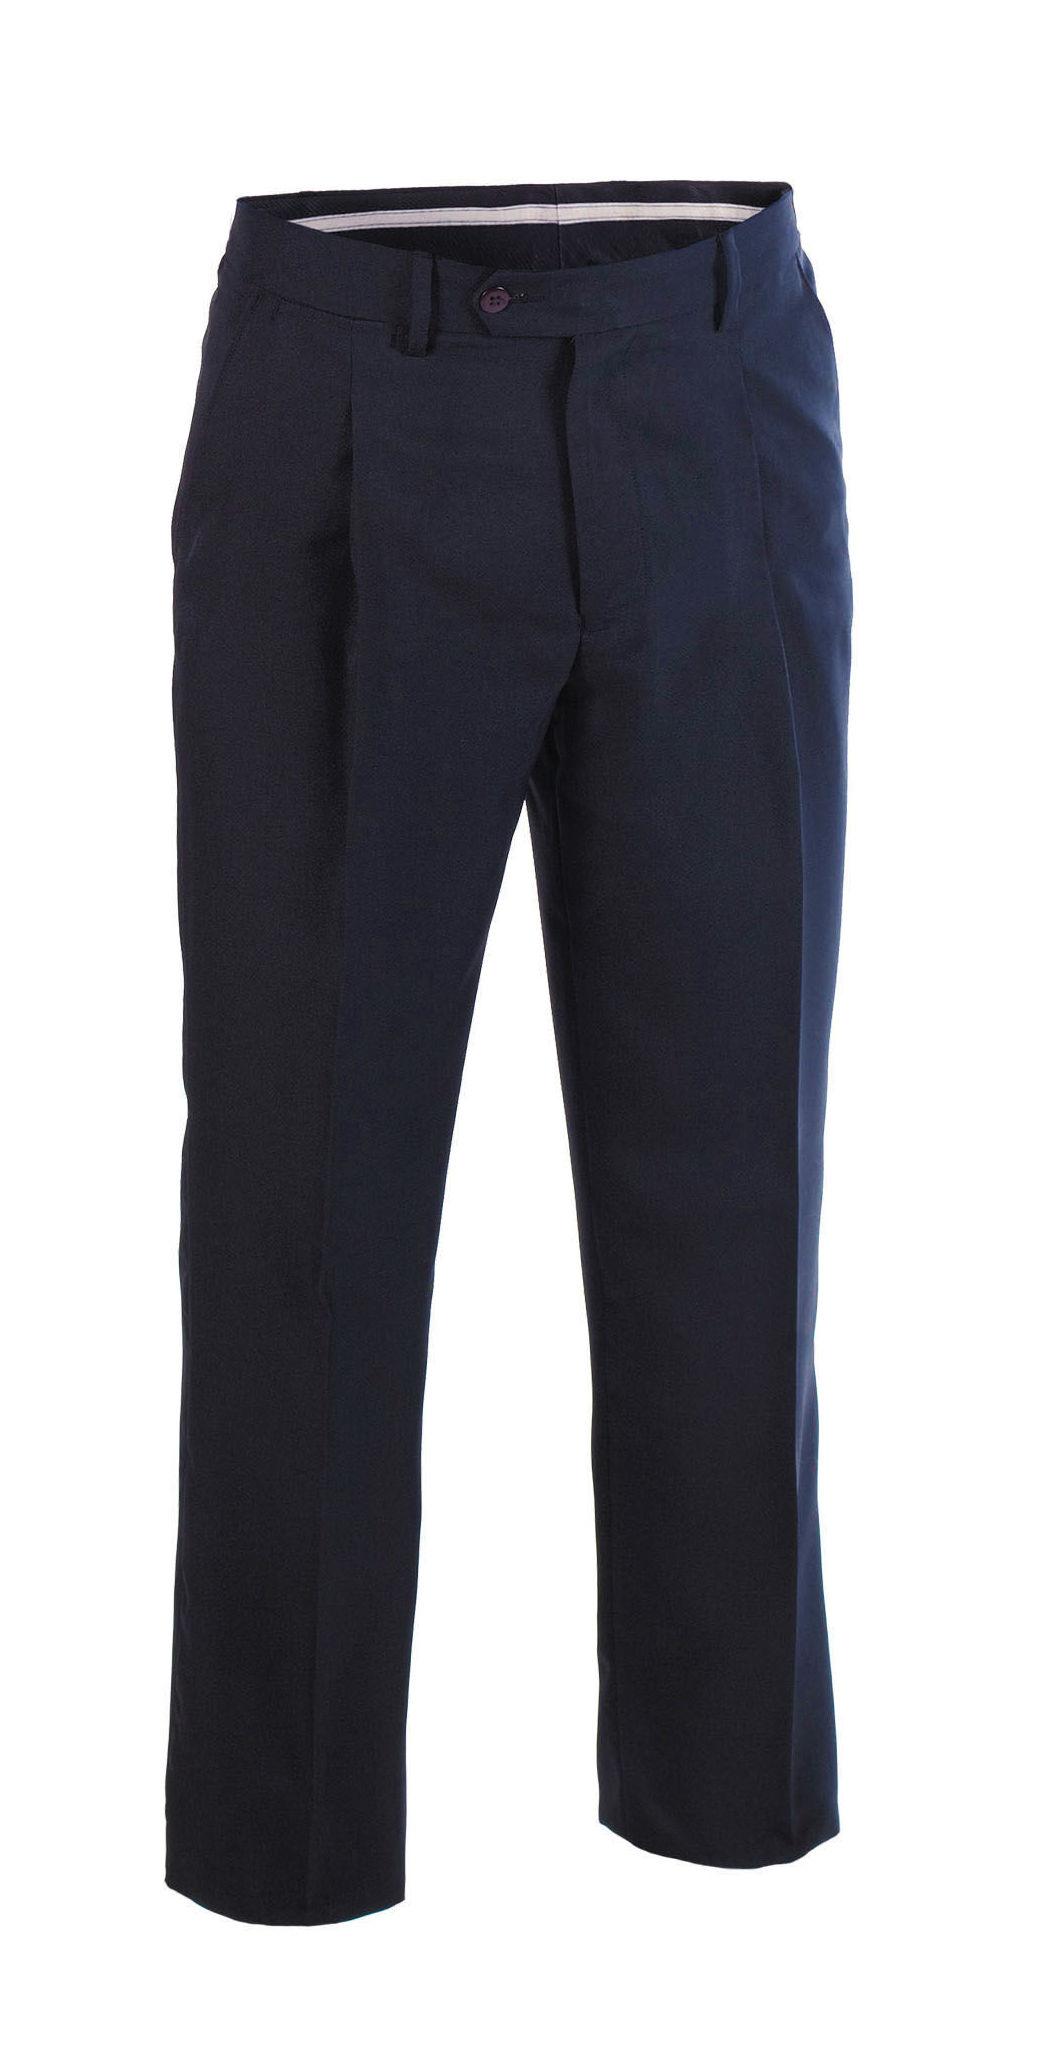 Pantalones hombre: Catálogo de Frade Ropa de Trabajo